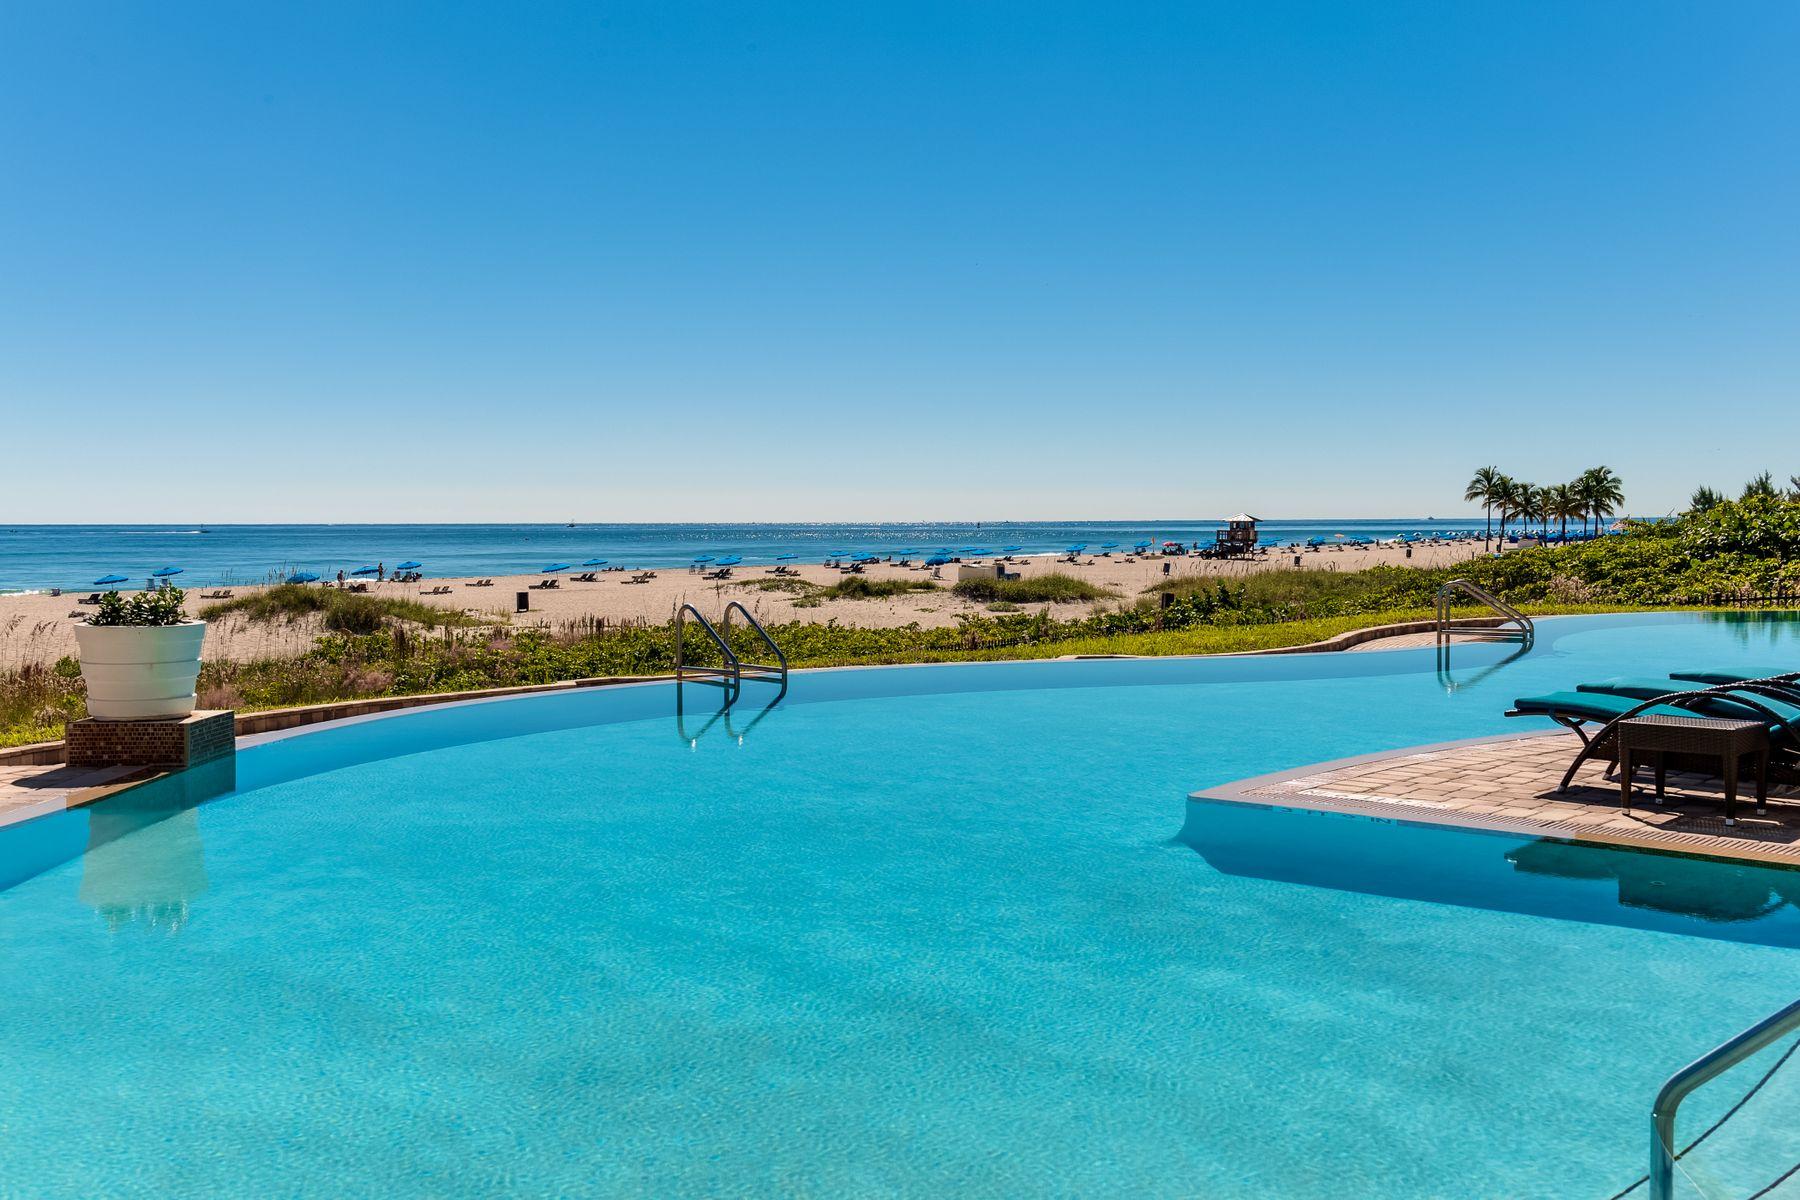 Condominium for Active at 2700 N Ocean Blvd 2700 N Ocean Blvd 903B Singer Island, Florida 33404 United States